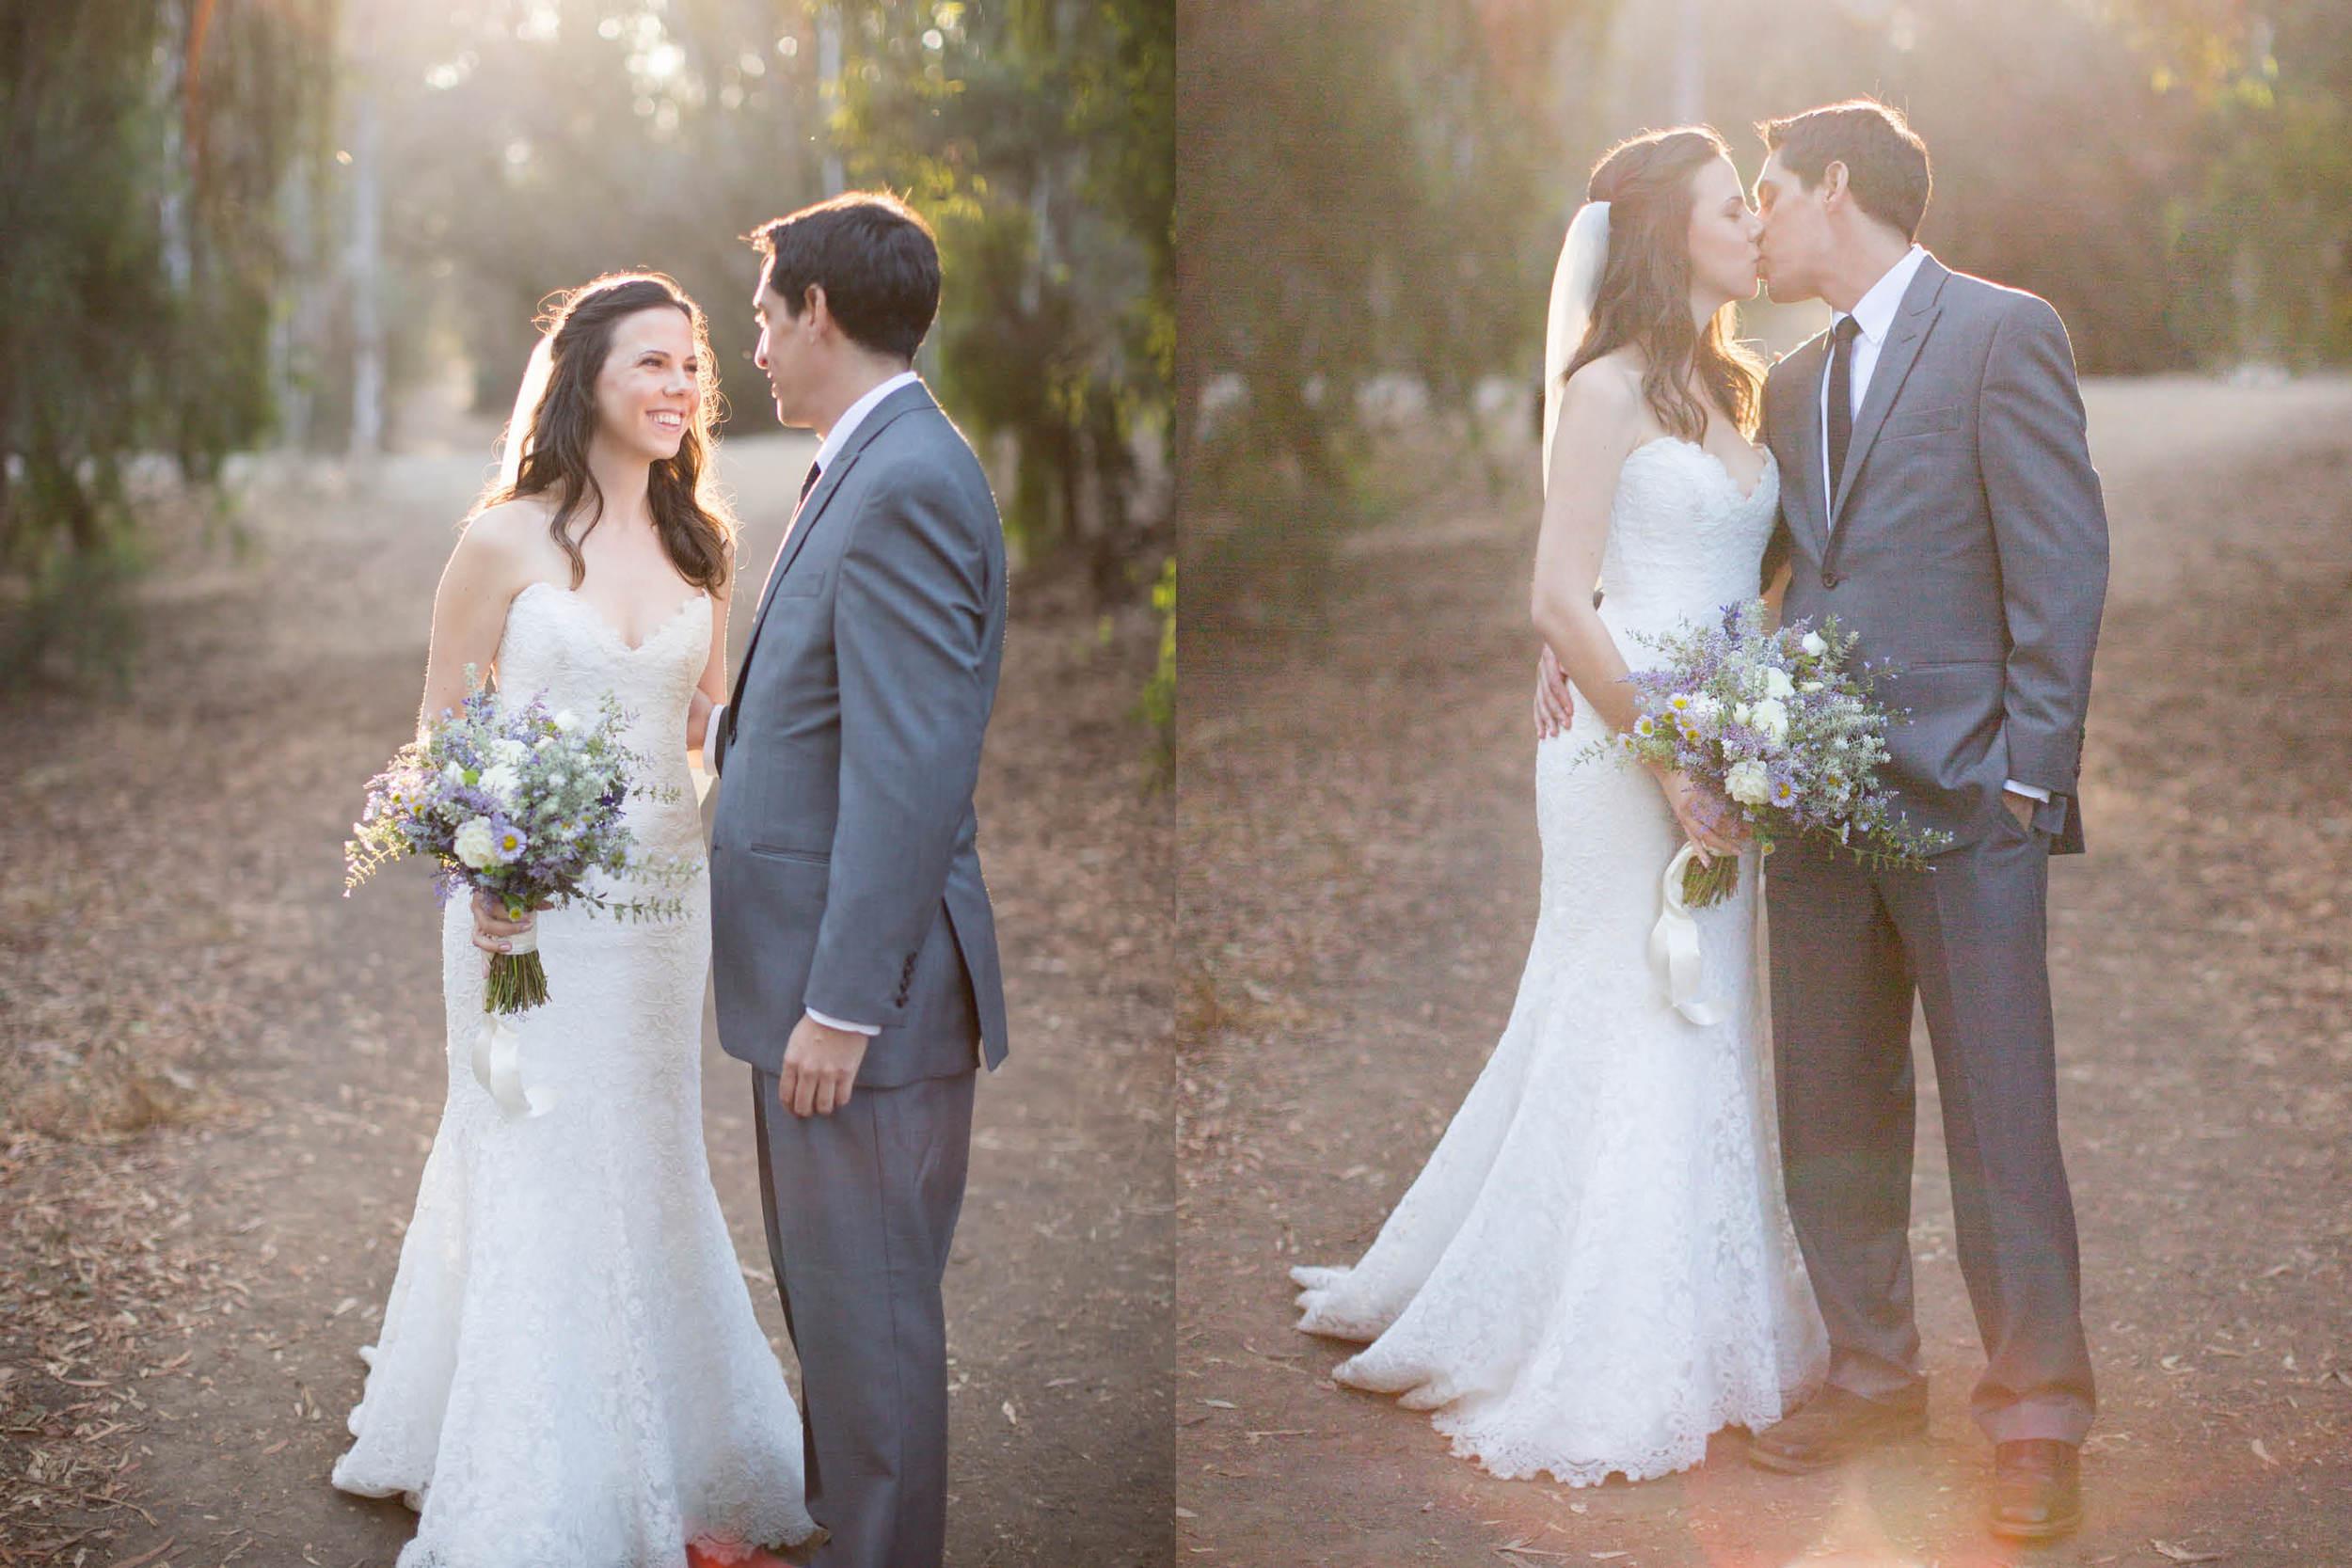 santa-barbara-elopement-bluff-eucalyptus-grove-wedding-planner-rustic (5).jpg